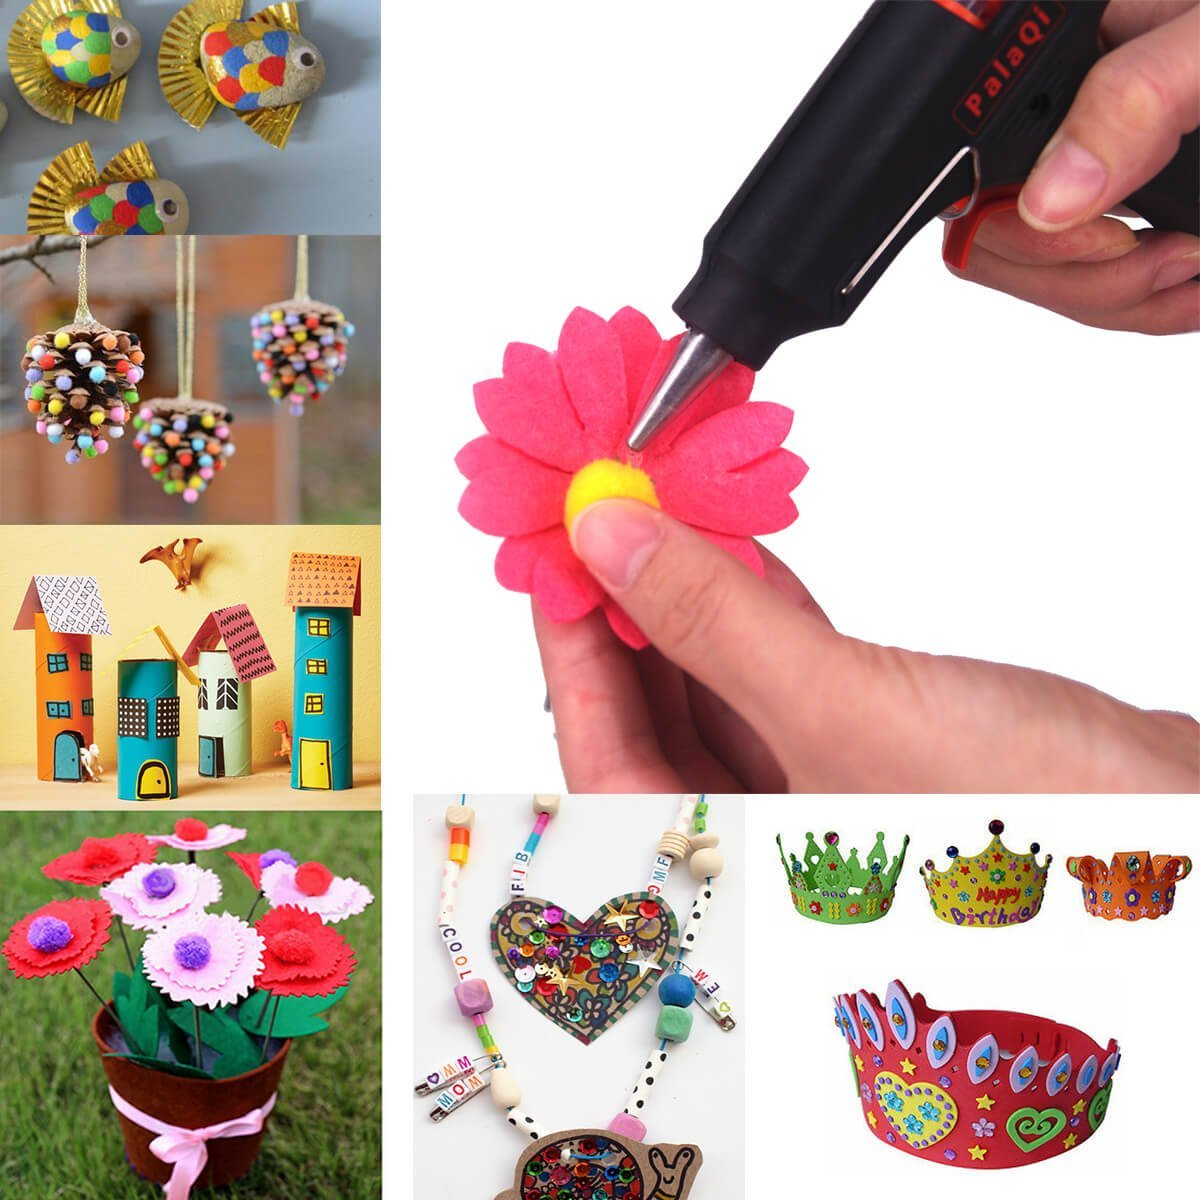 PalaQi Hot Glue Gun,Mini Glue Gun Kit with 50pcs Glue Sticks 20 Watts High Temperature Glue Gun for Artistic Creation Crafts Gifts Sealing DIY Small Craft Projects and Home School Office Quick Repairs